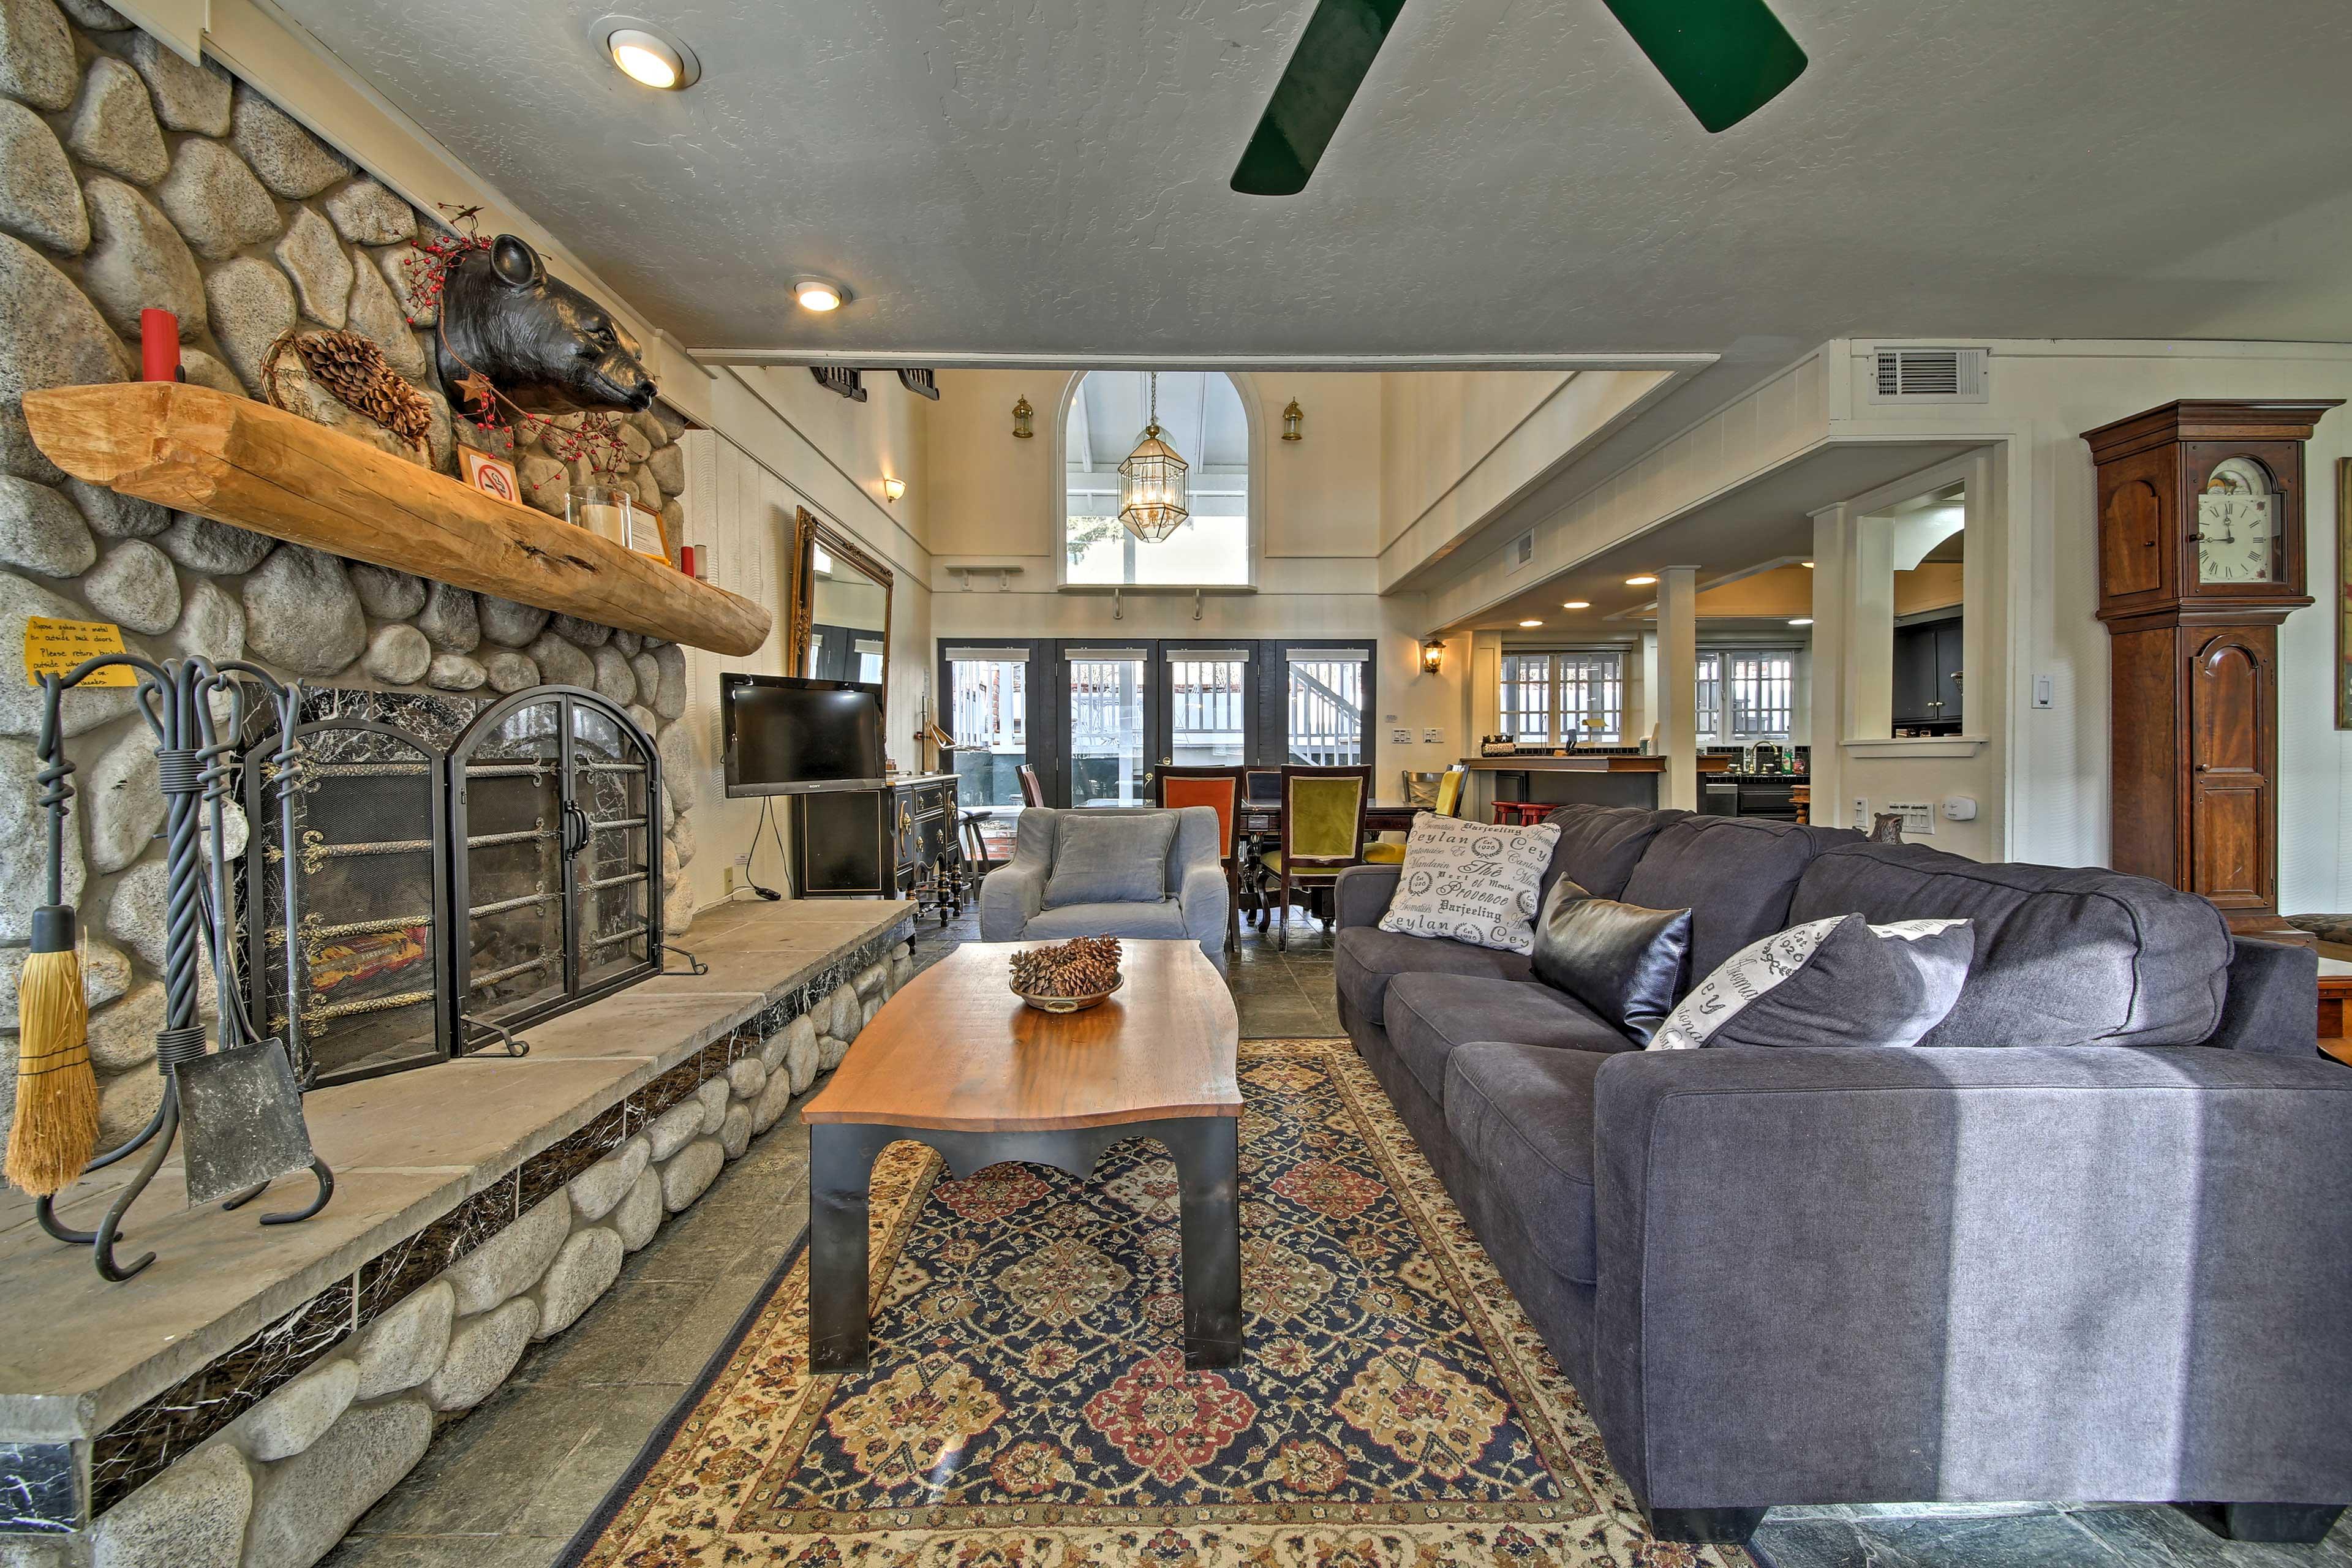 The home features an open-concept floor plan.